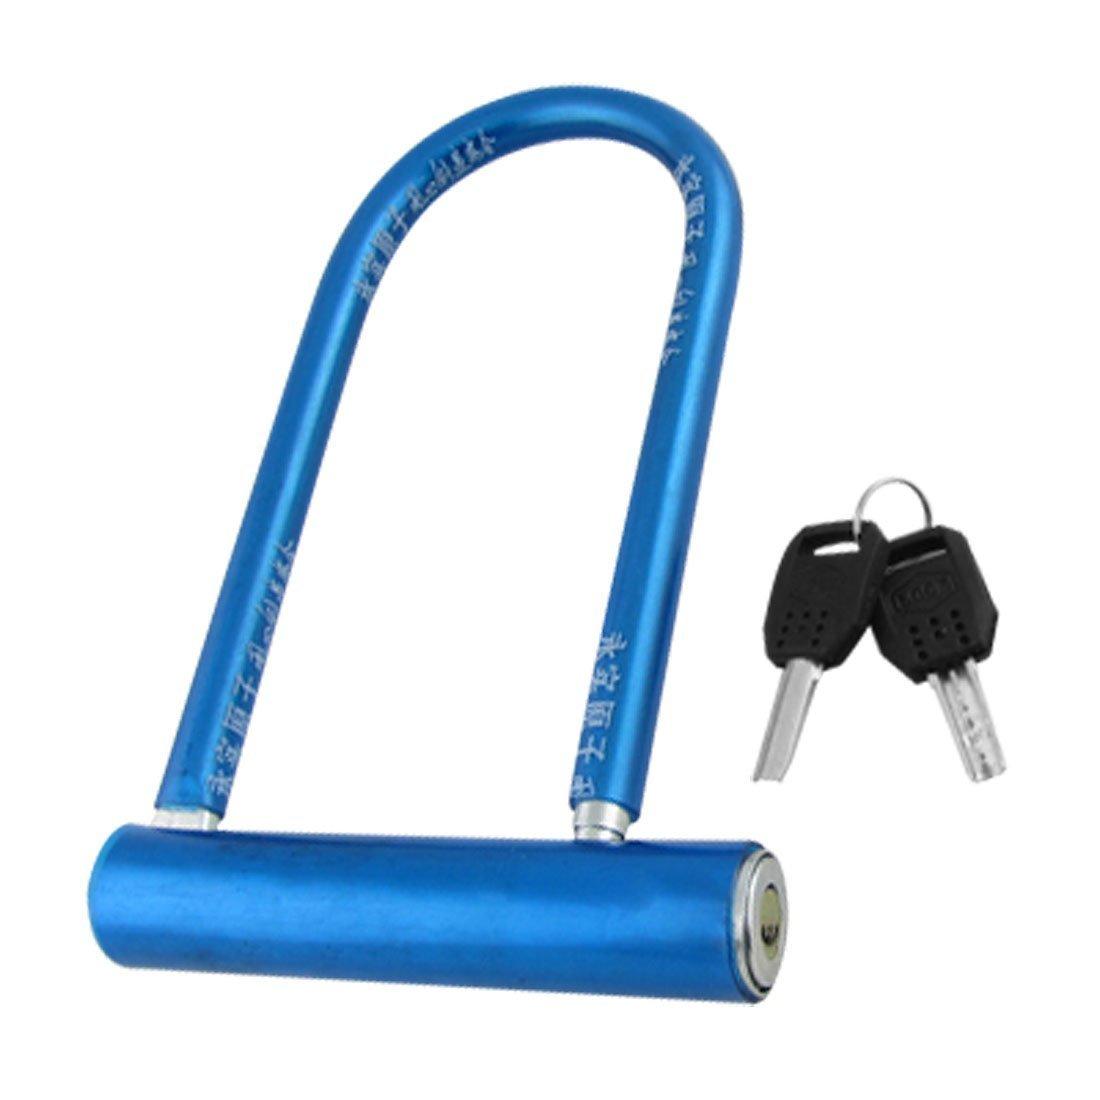 seguridad Plastic coated Blue metal-U-Lock Bicicleta DealMux Ciclismo